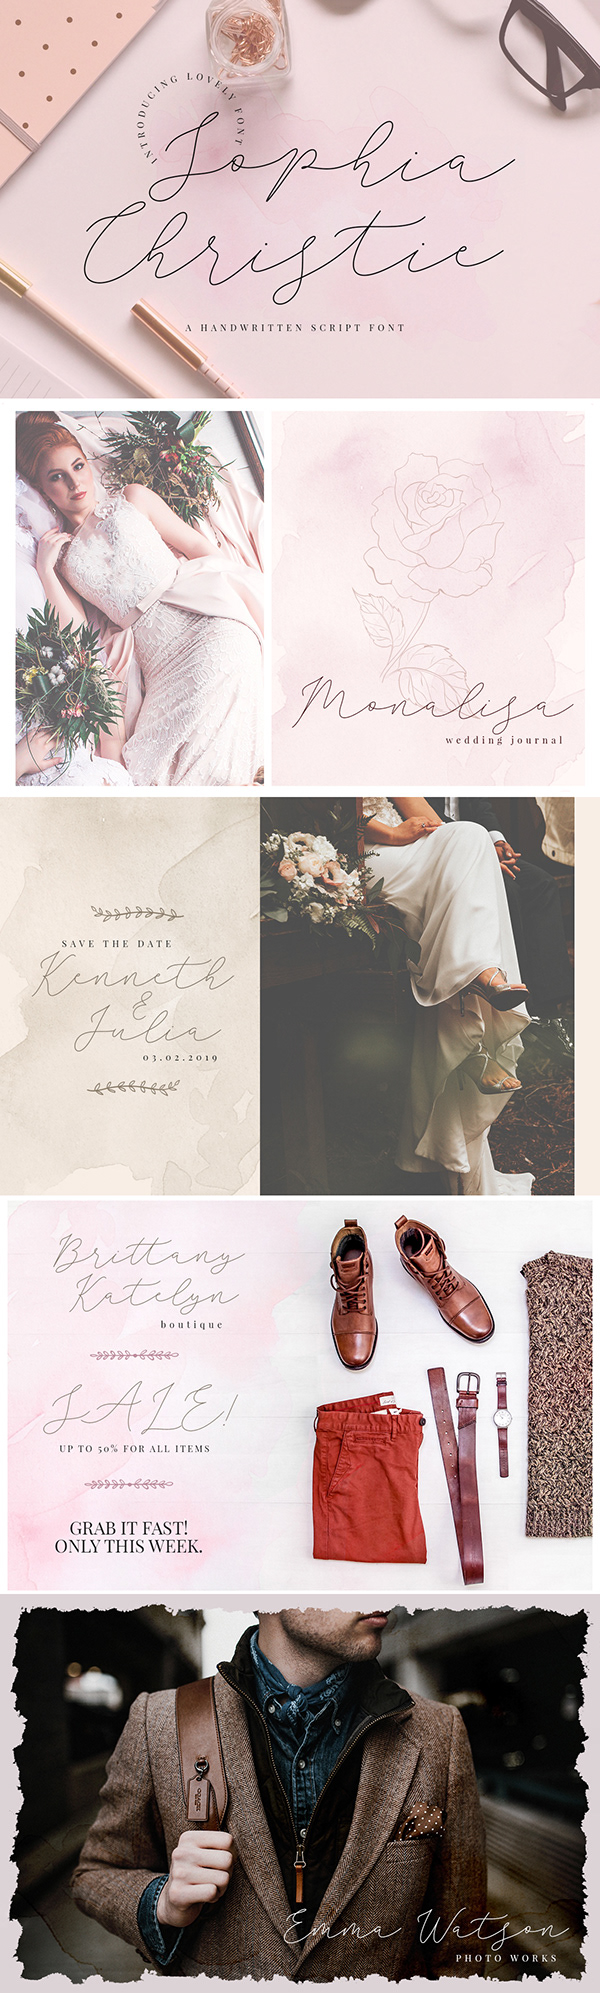 Free Sophia Christie Script Font on Wacom Gallery